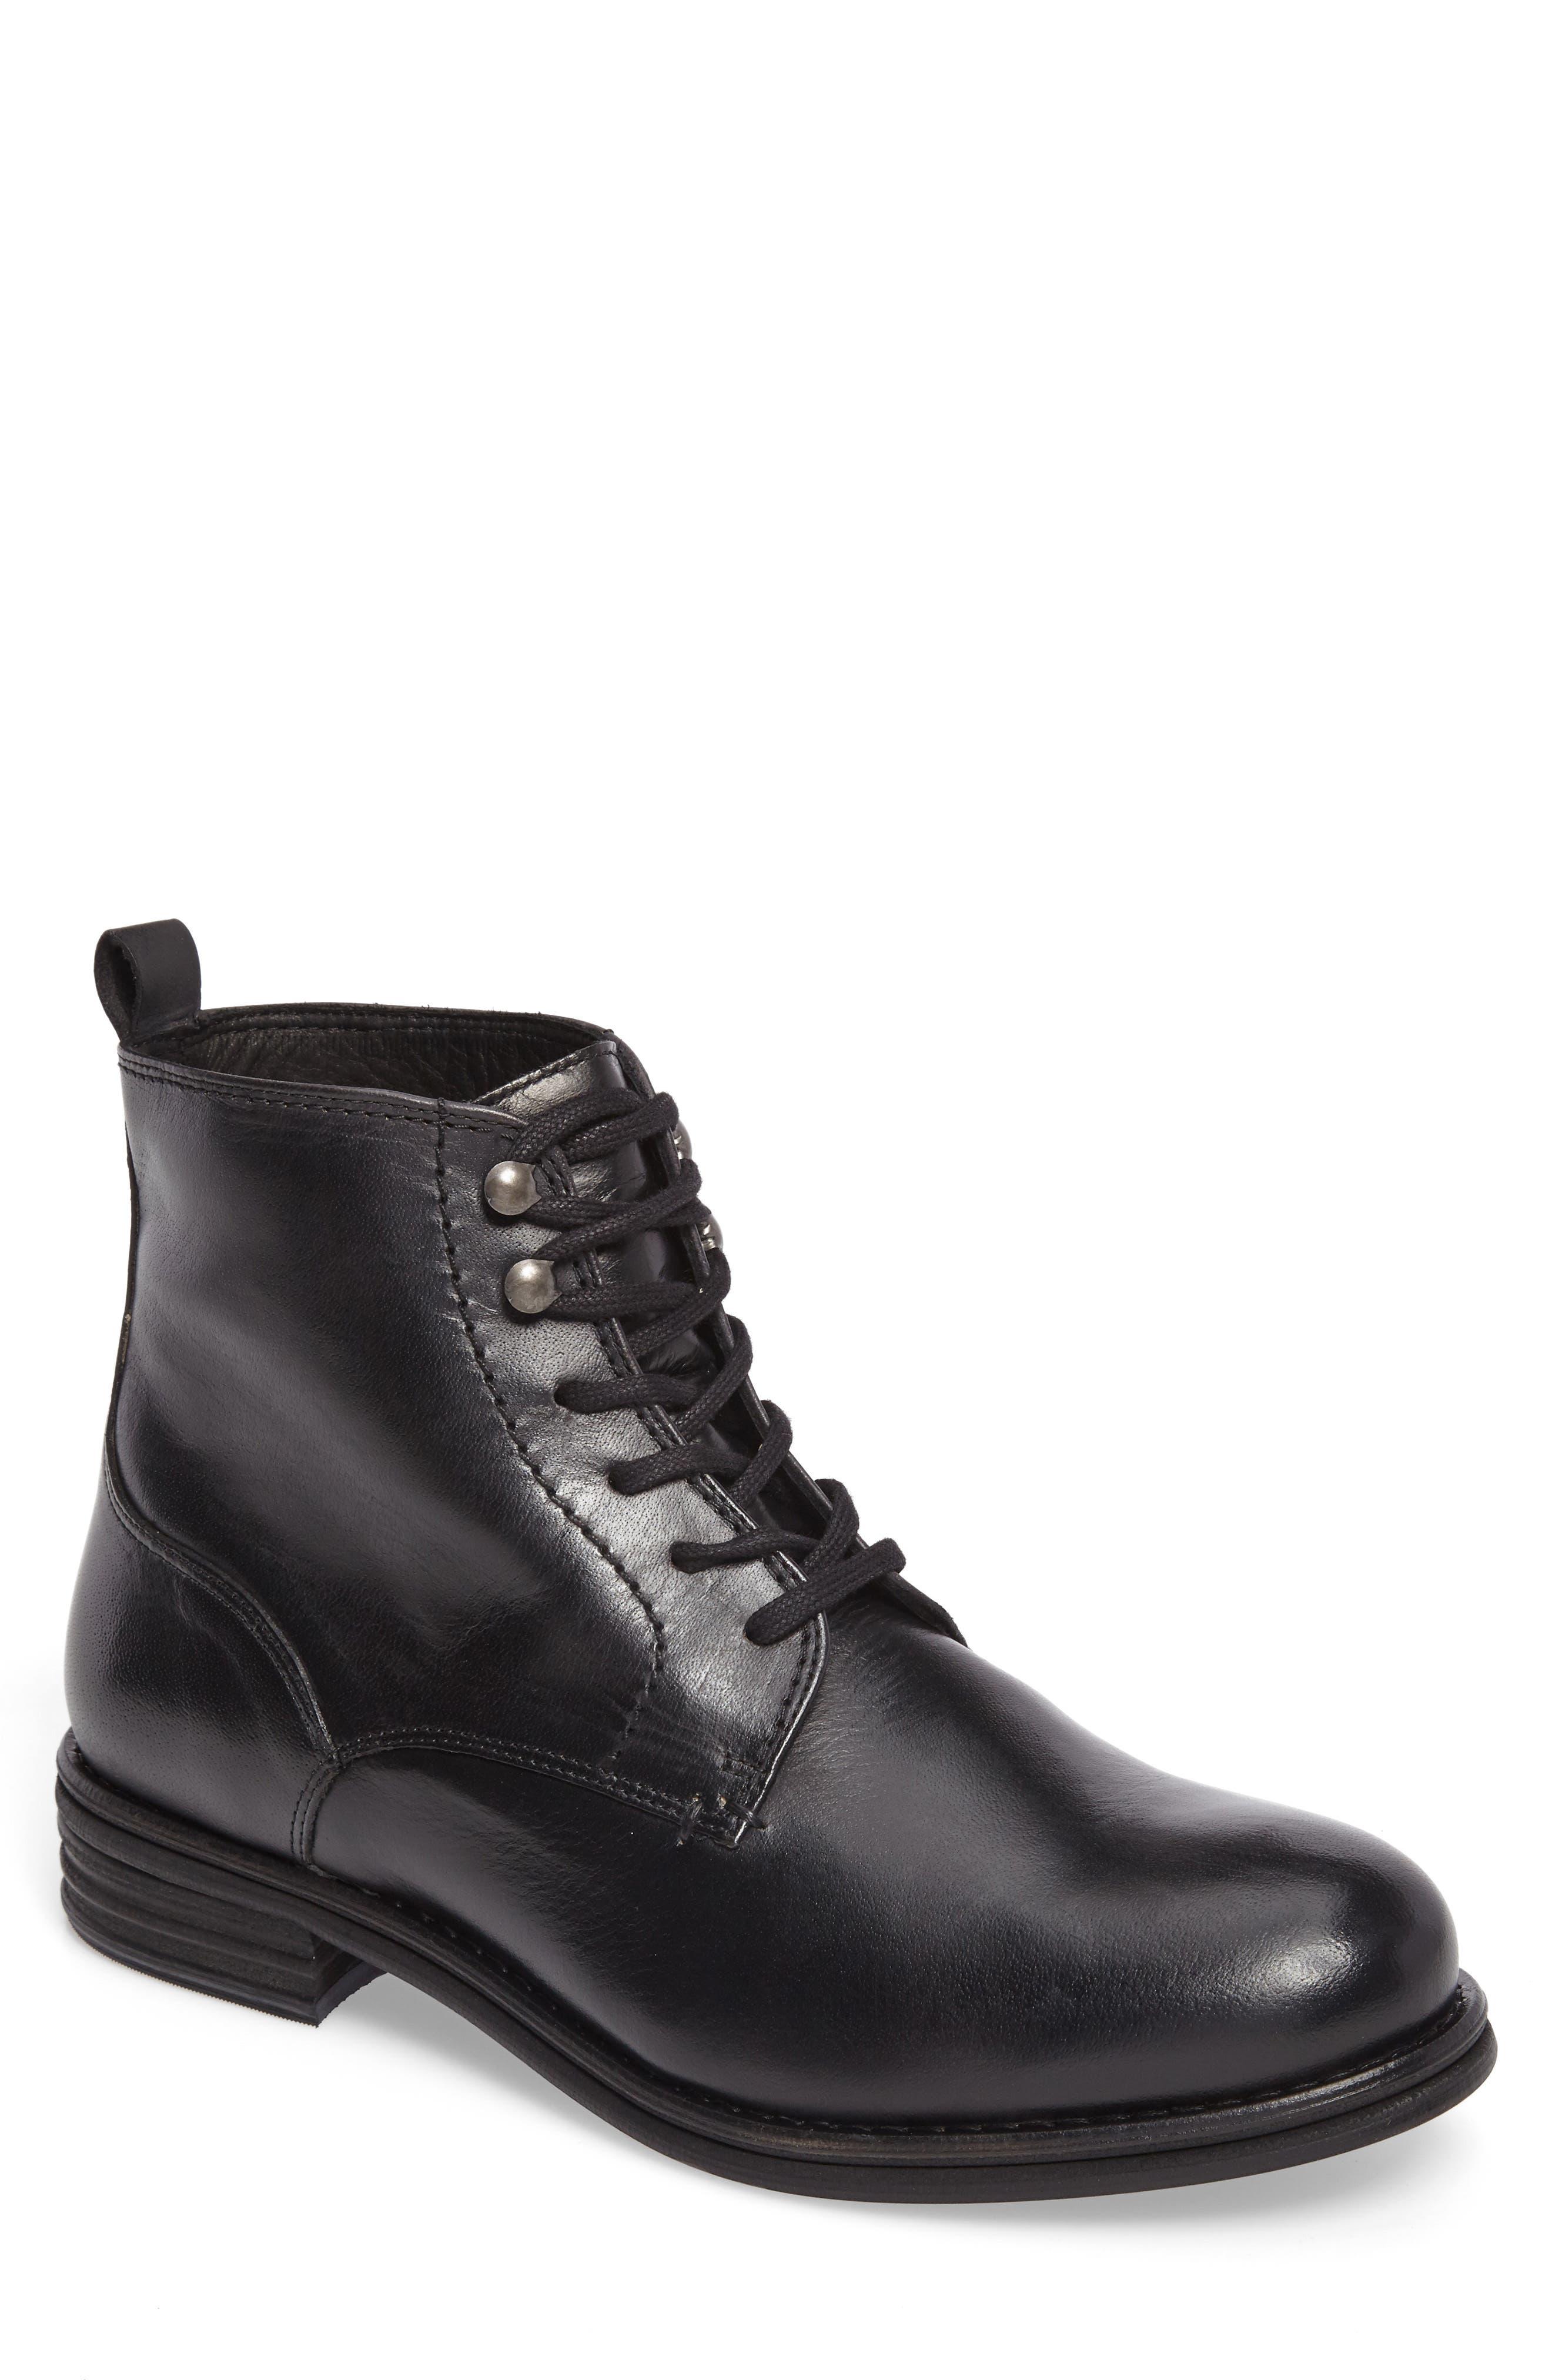 VINCE CAMUTO Cordie Plain Toe Boot, Main, color, 001